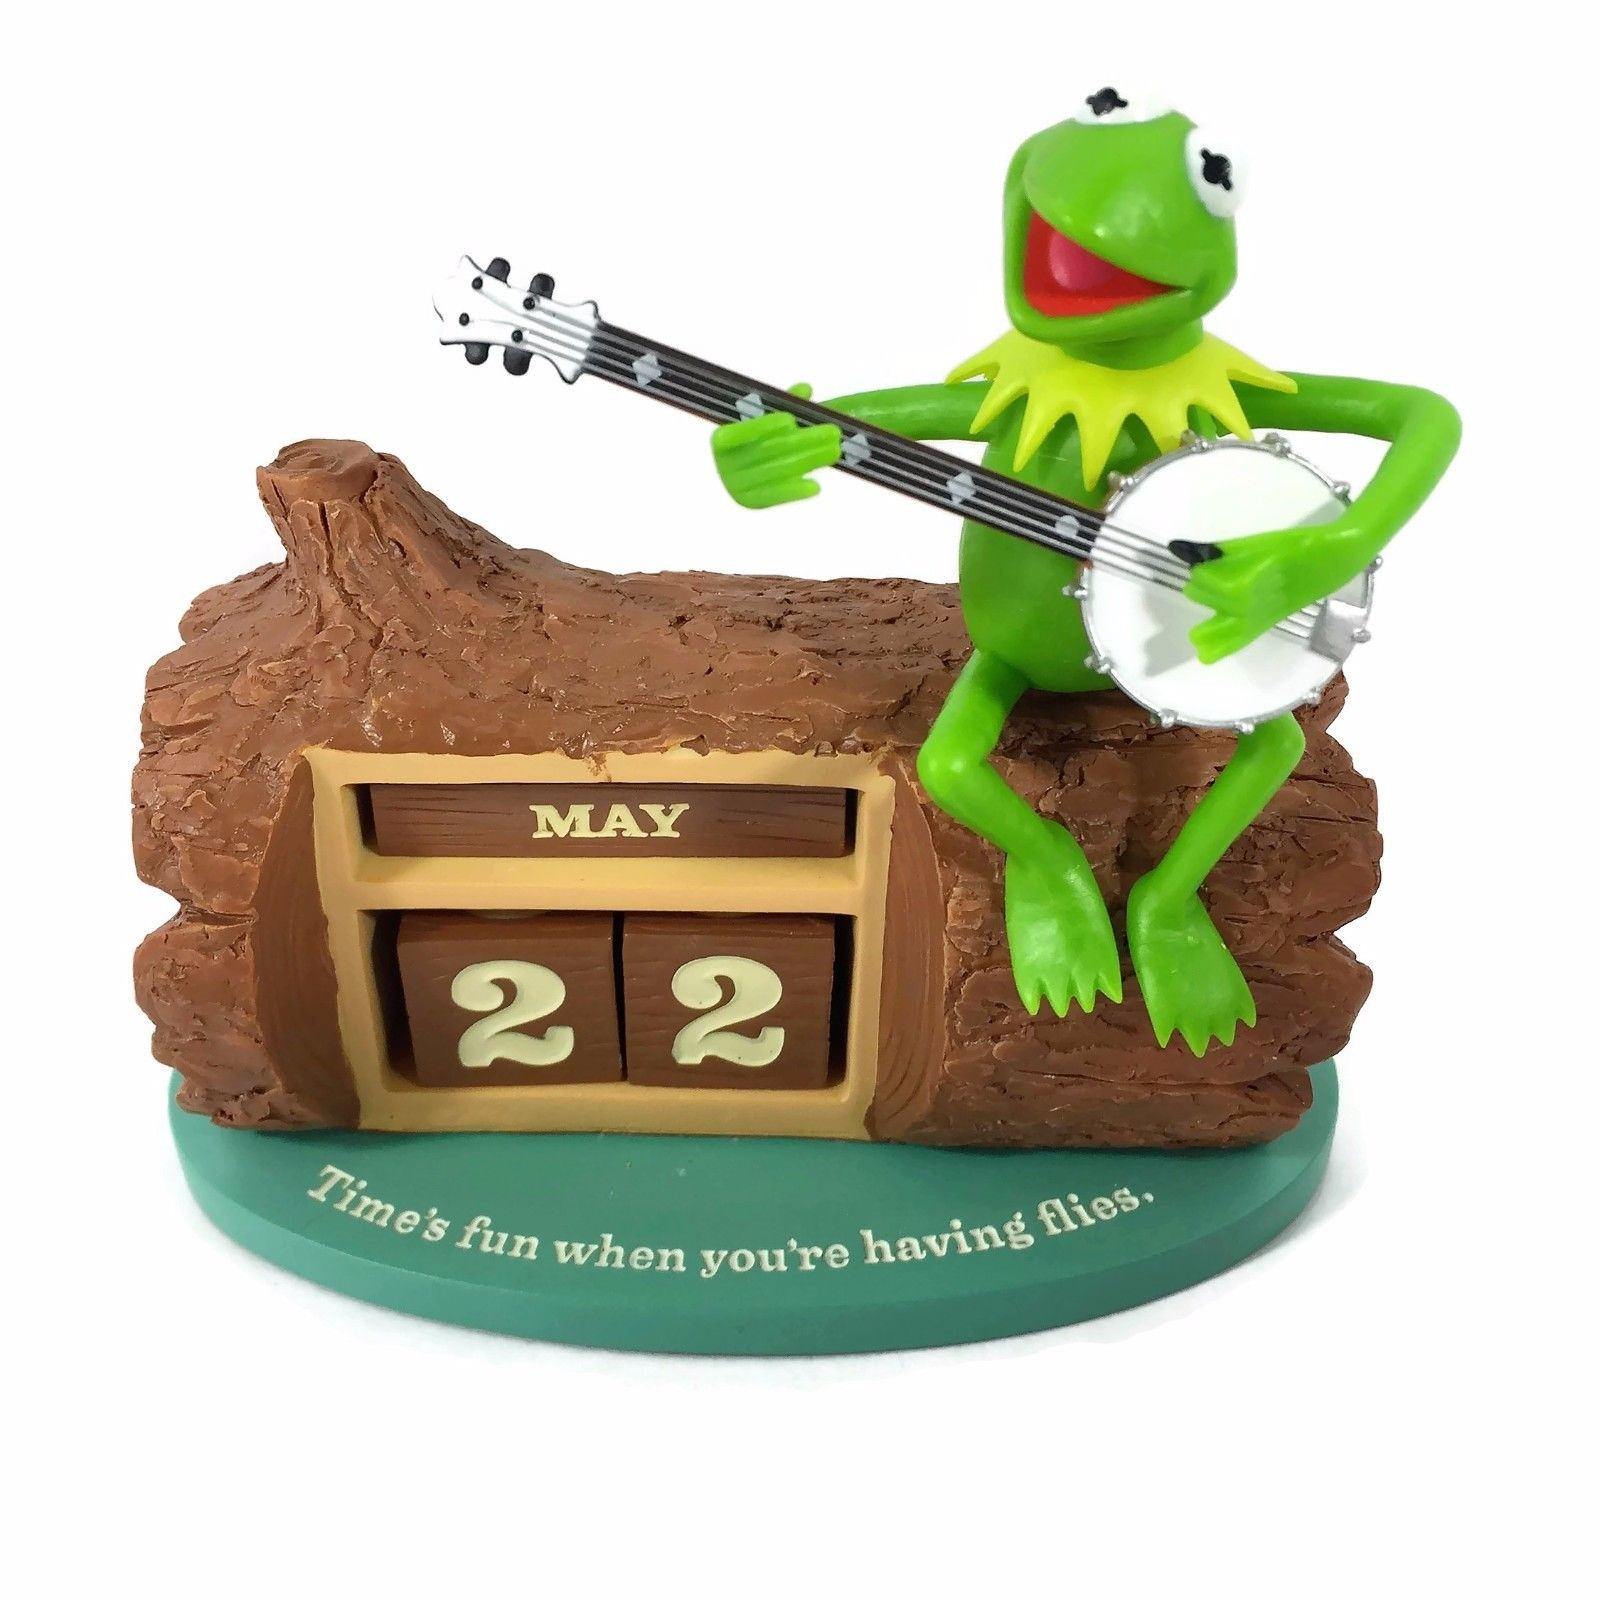 Kermit the Frog perpetual calendar | Muppet Wiki | FANDOM powered by ...